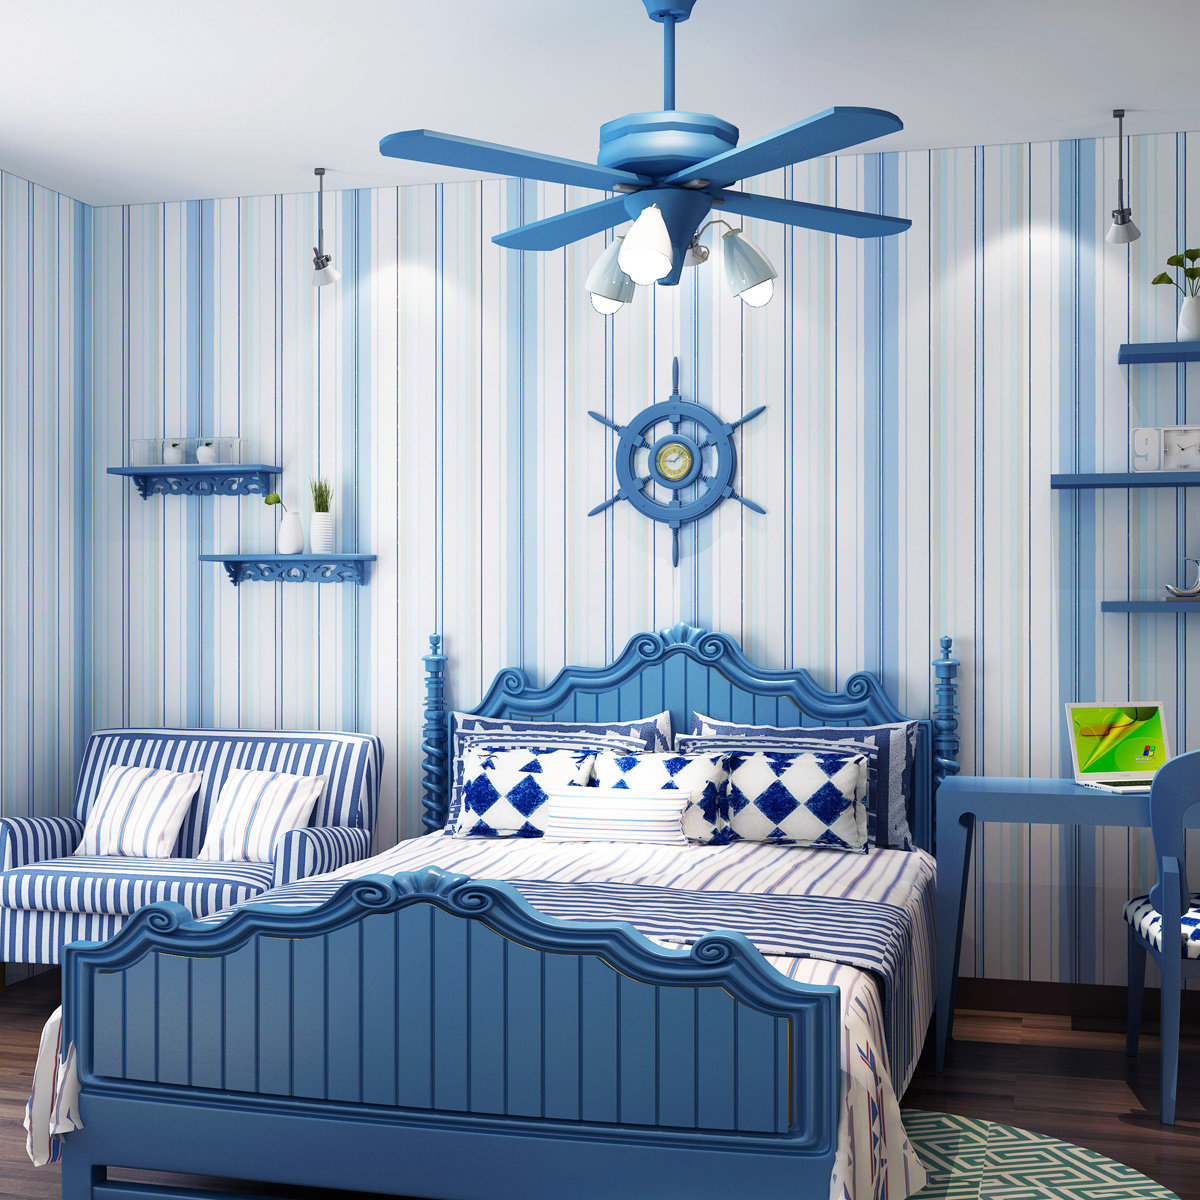 bedroom boy children simple living beach themed vertical stripe wallpapers sea